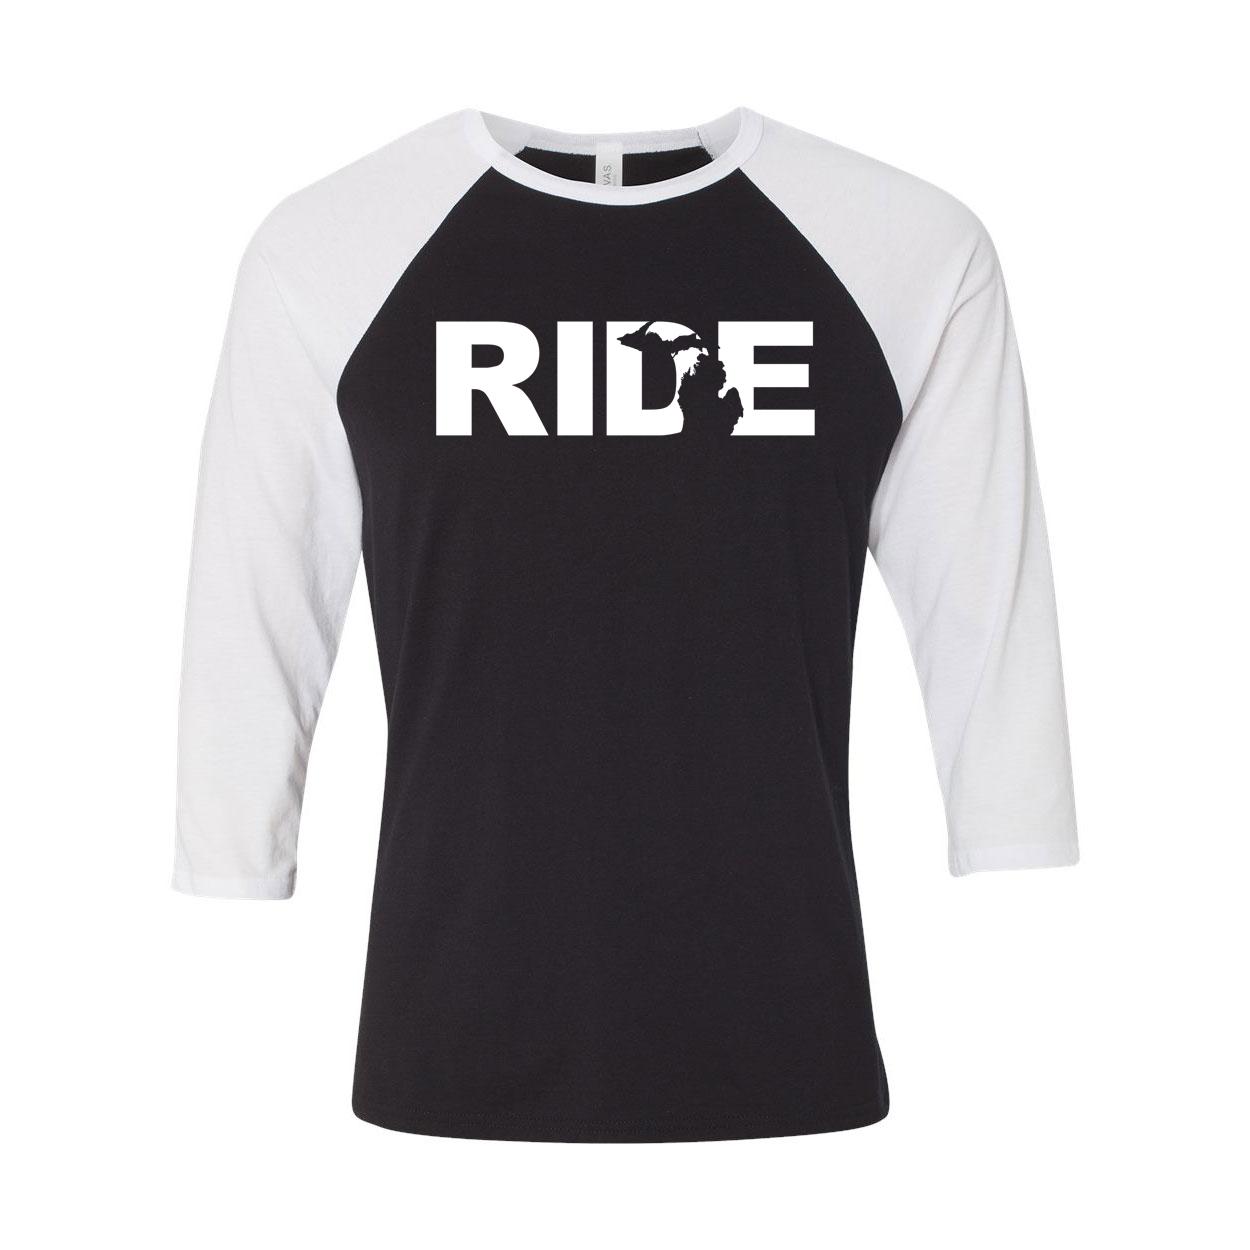 Ride Michigan Classic Raglan Shirt Black/White (White Logo)